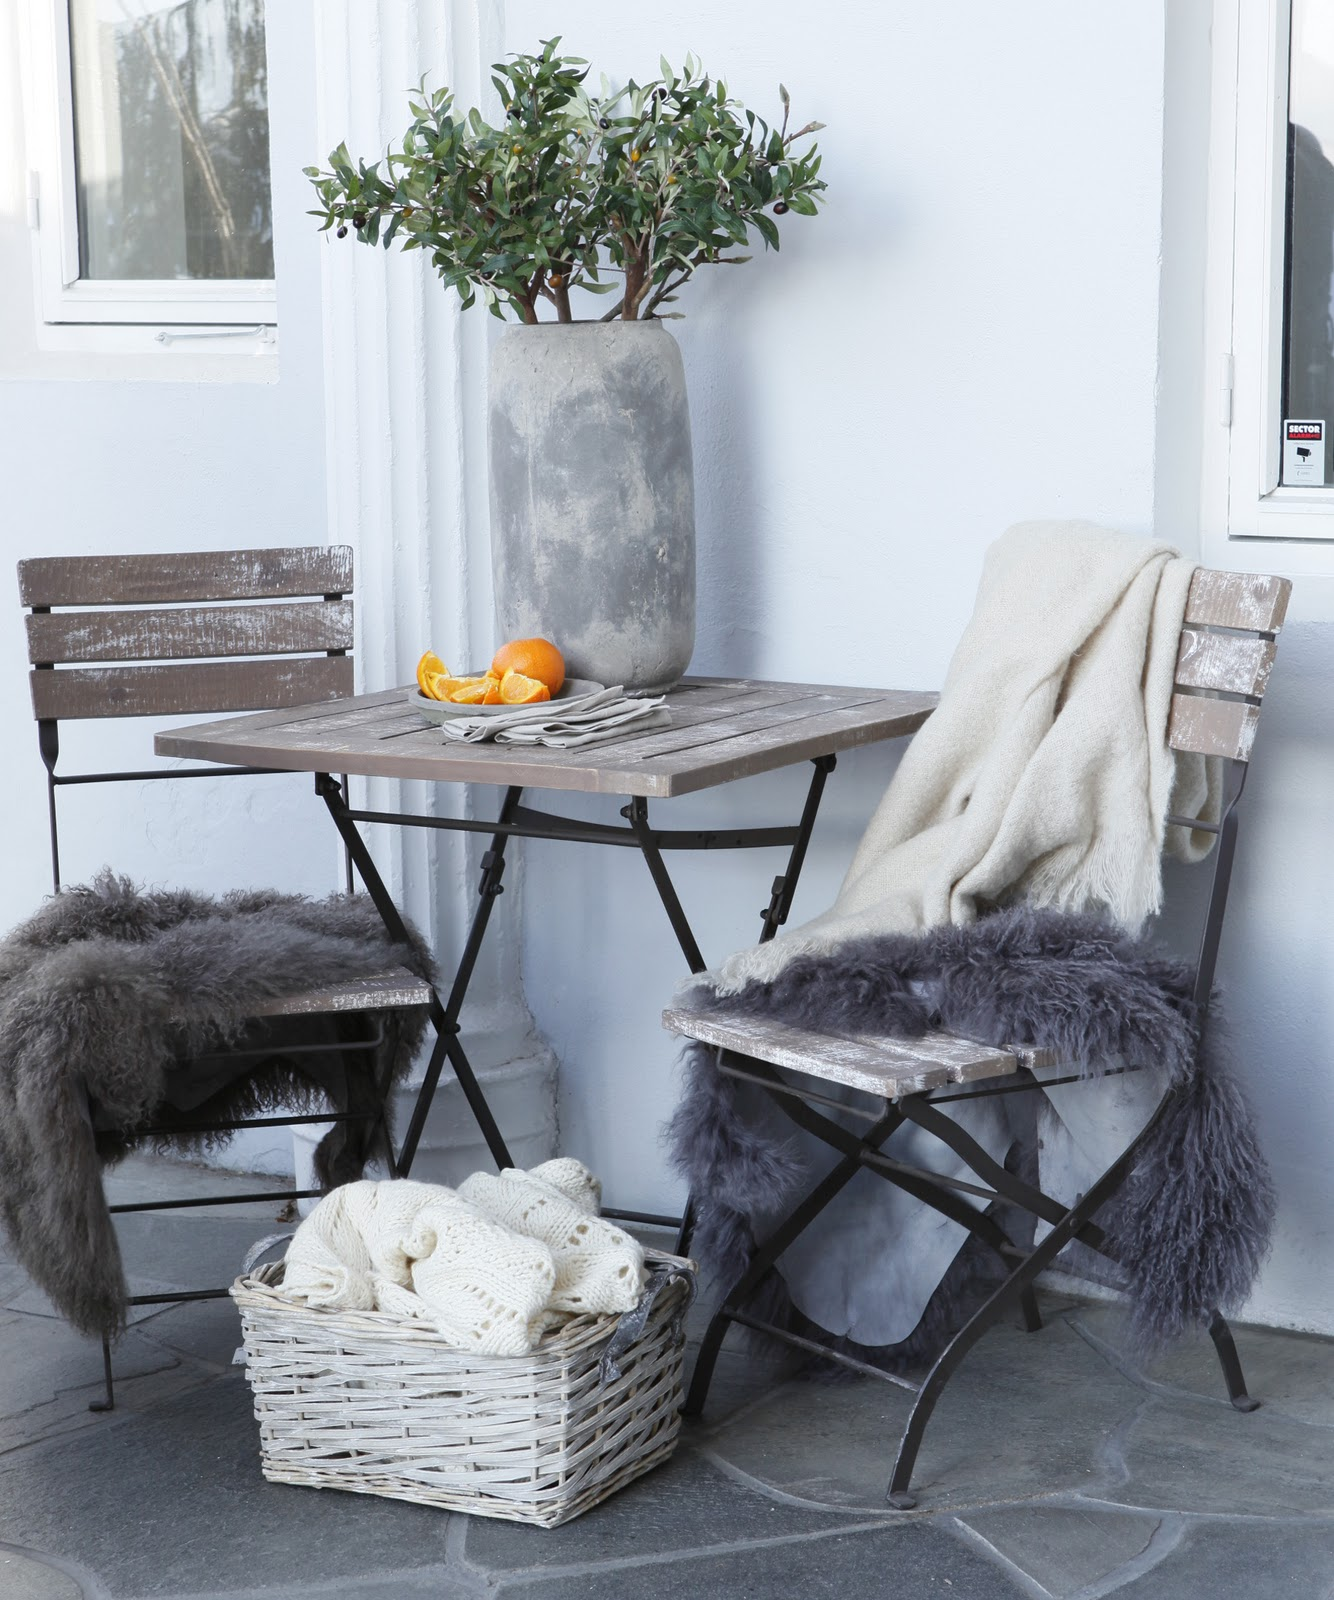 Blogg Home and Cottage: Hagesesongen er igang!